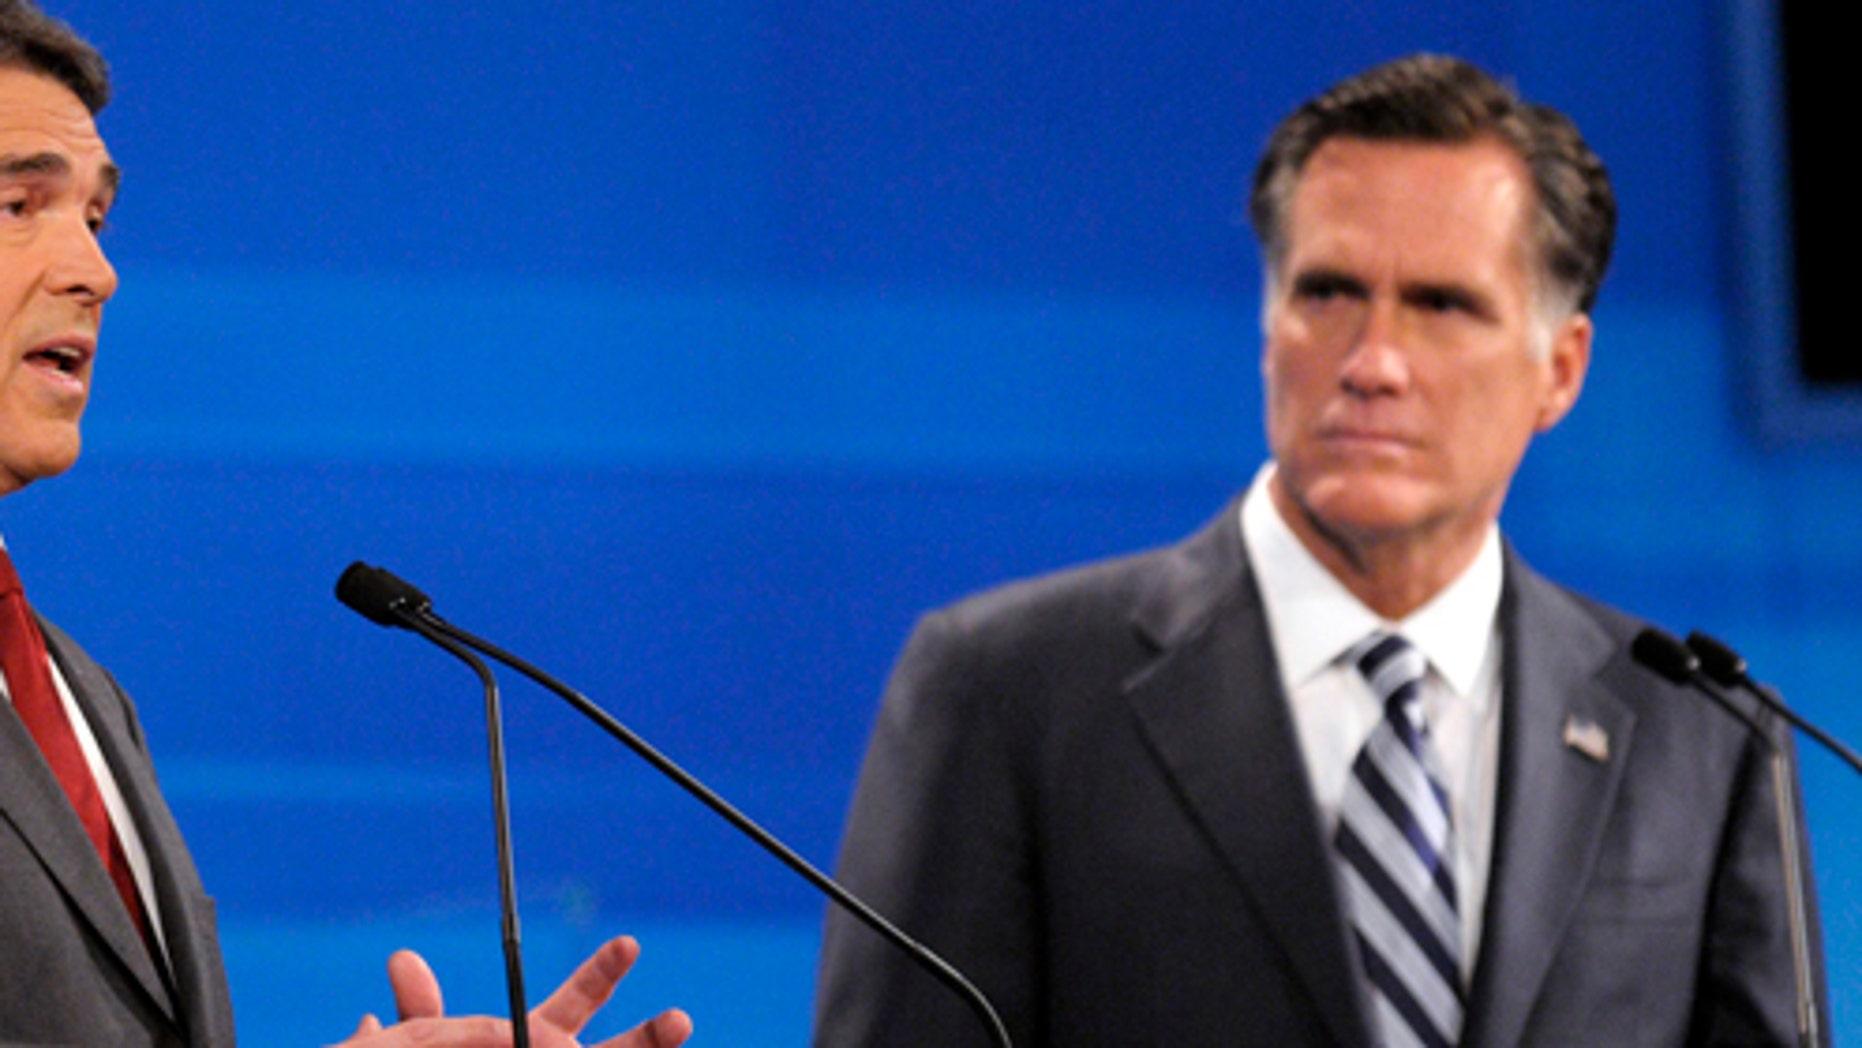 Republican presidential candidate former Massachusetts Gov. Mitt Romney, right, listens as Texas Gov. Rick Perry makes a statement during a debate Thursday, Sept. 22, 2011, in Orlando, Fla. (AP Photo/Phelan M. Ebenhack, Pool)